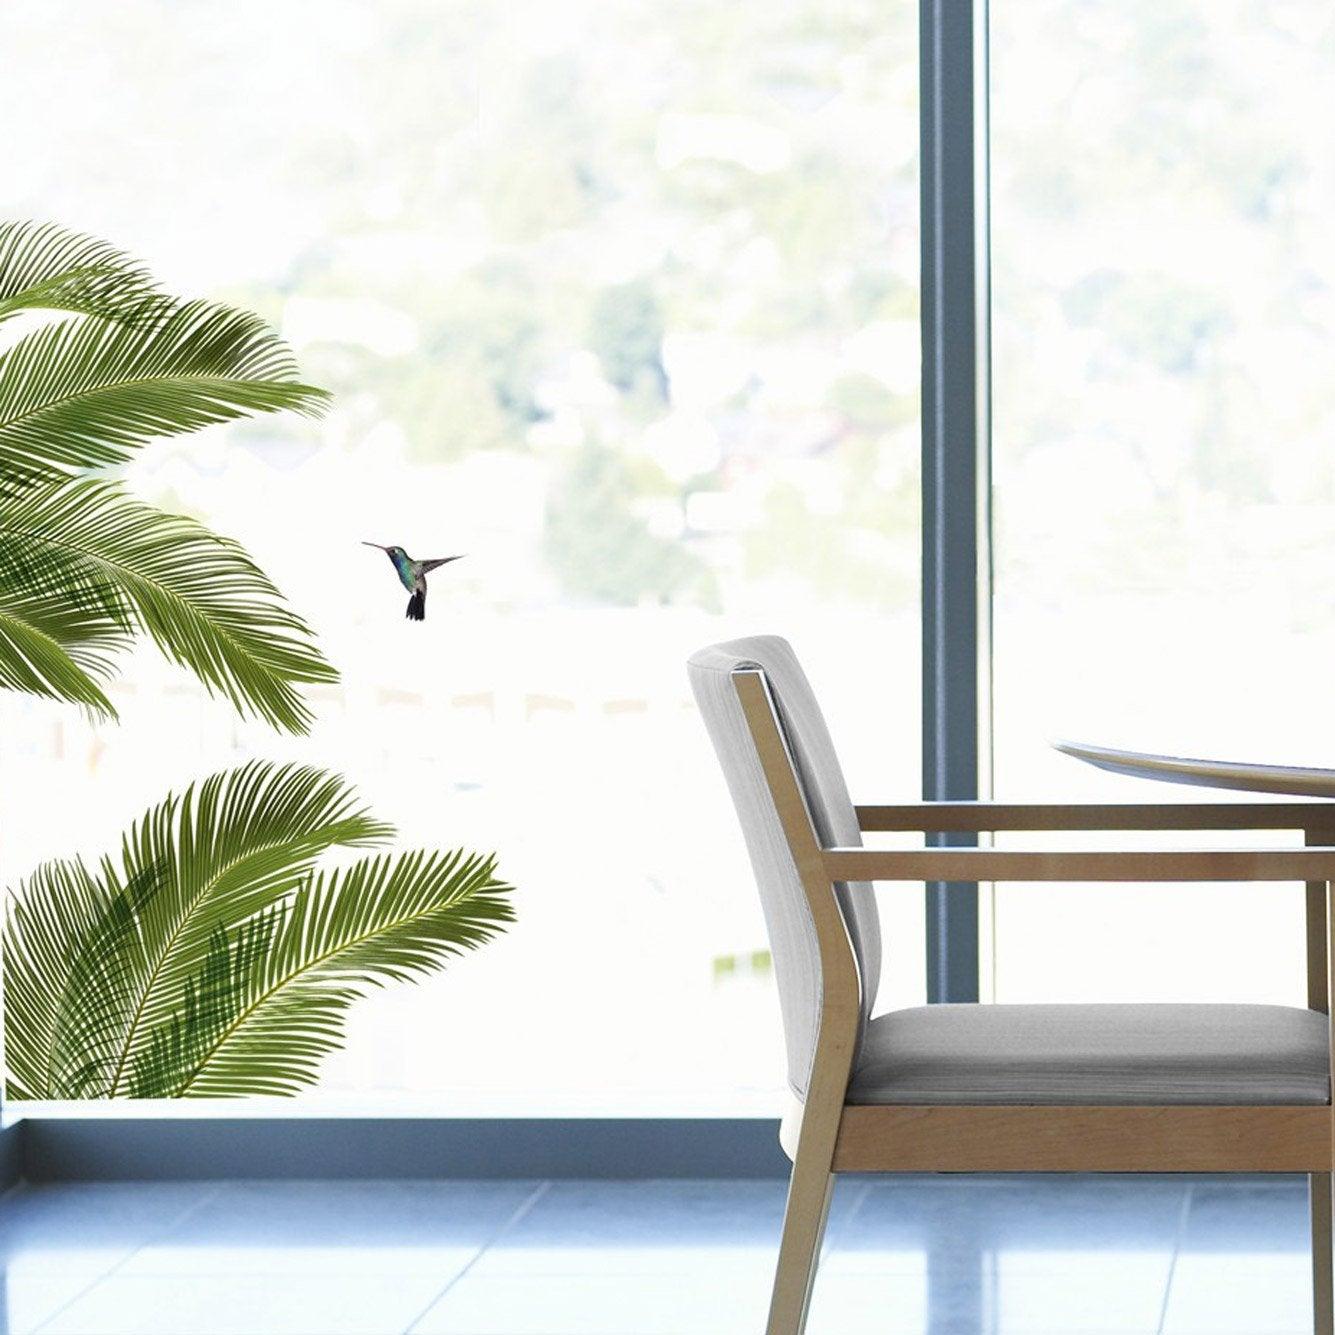 sticker palmes 49 x 69 cm leroy merlin. Black Bedroom Furniture Sets. Home Design Ideas